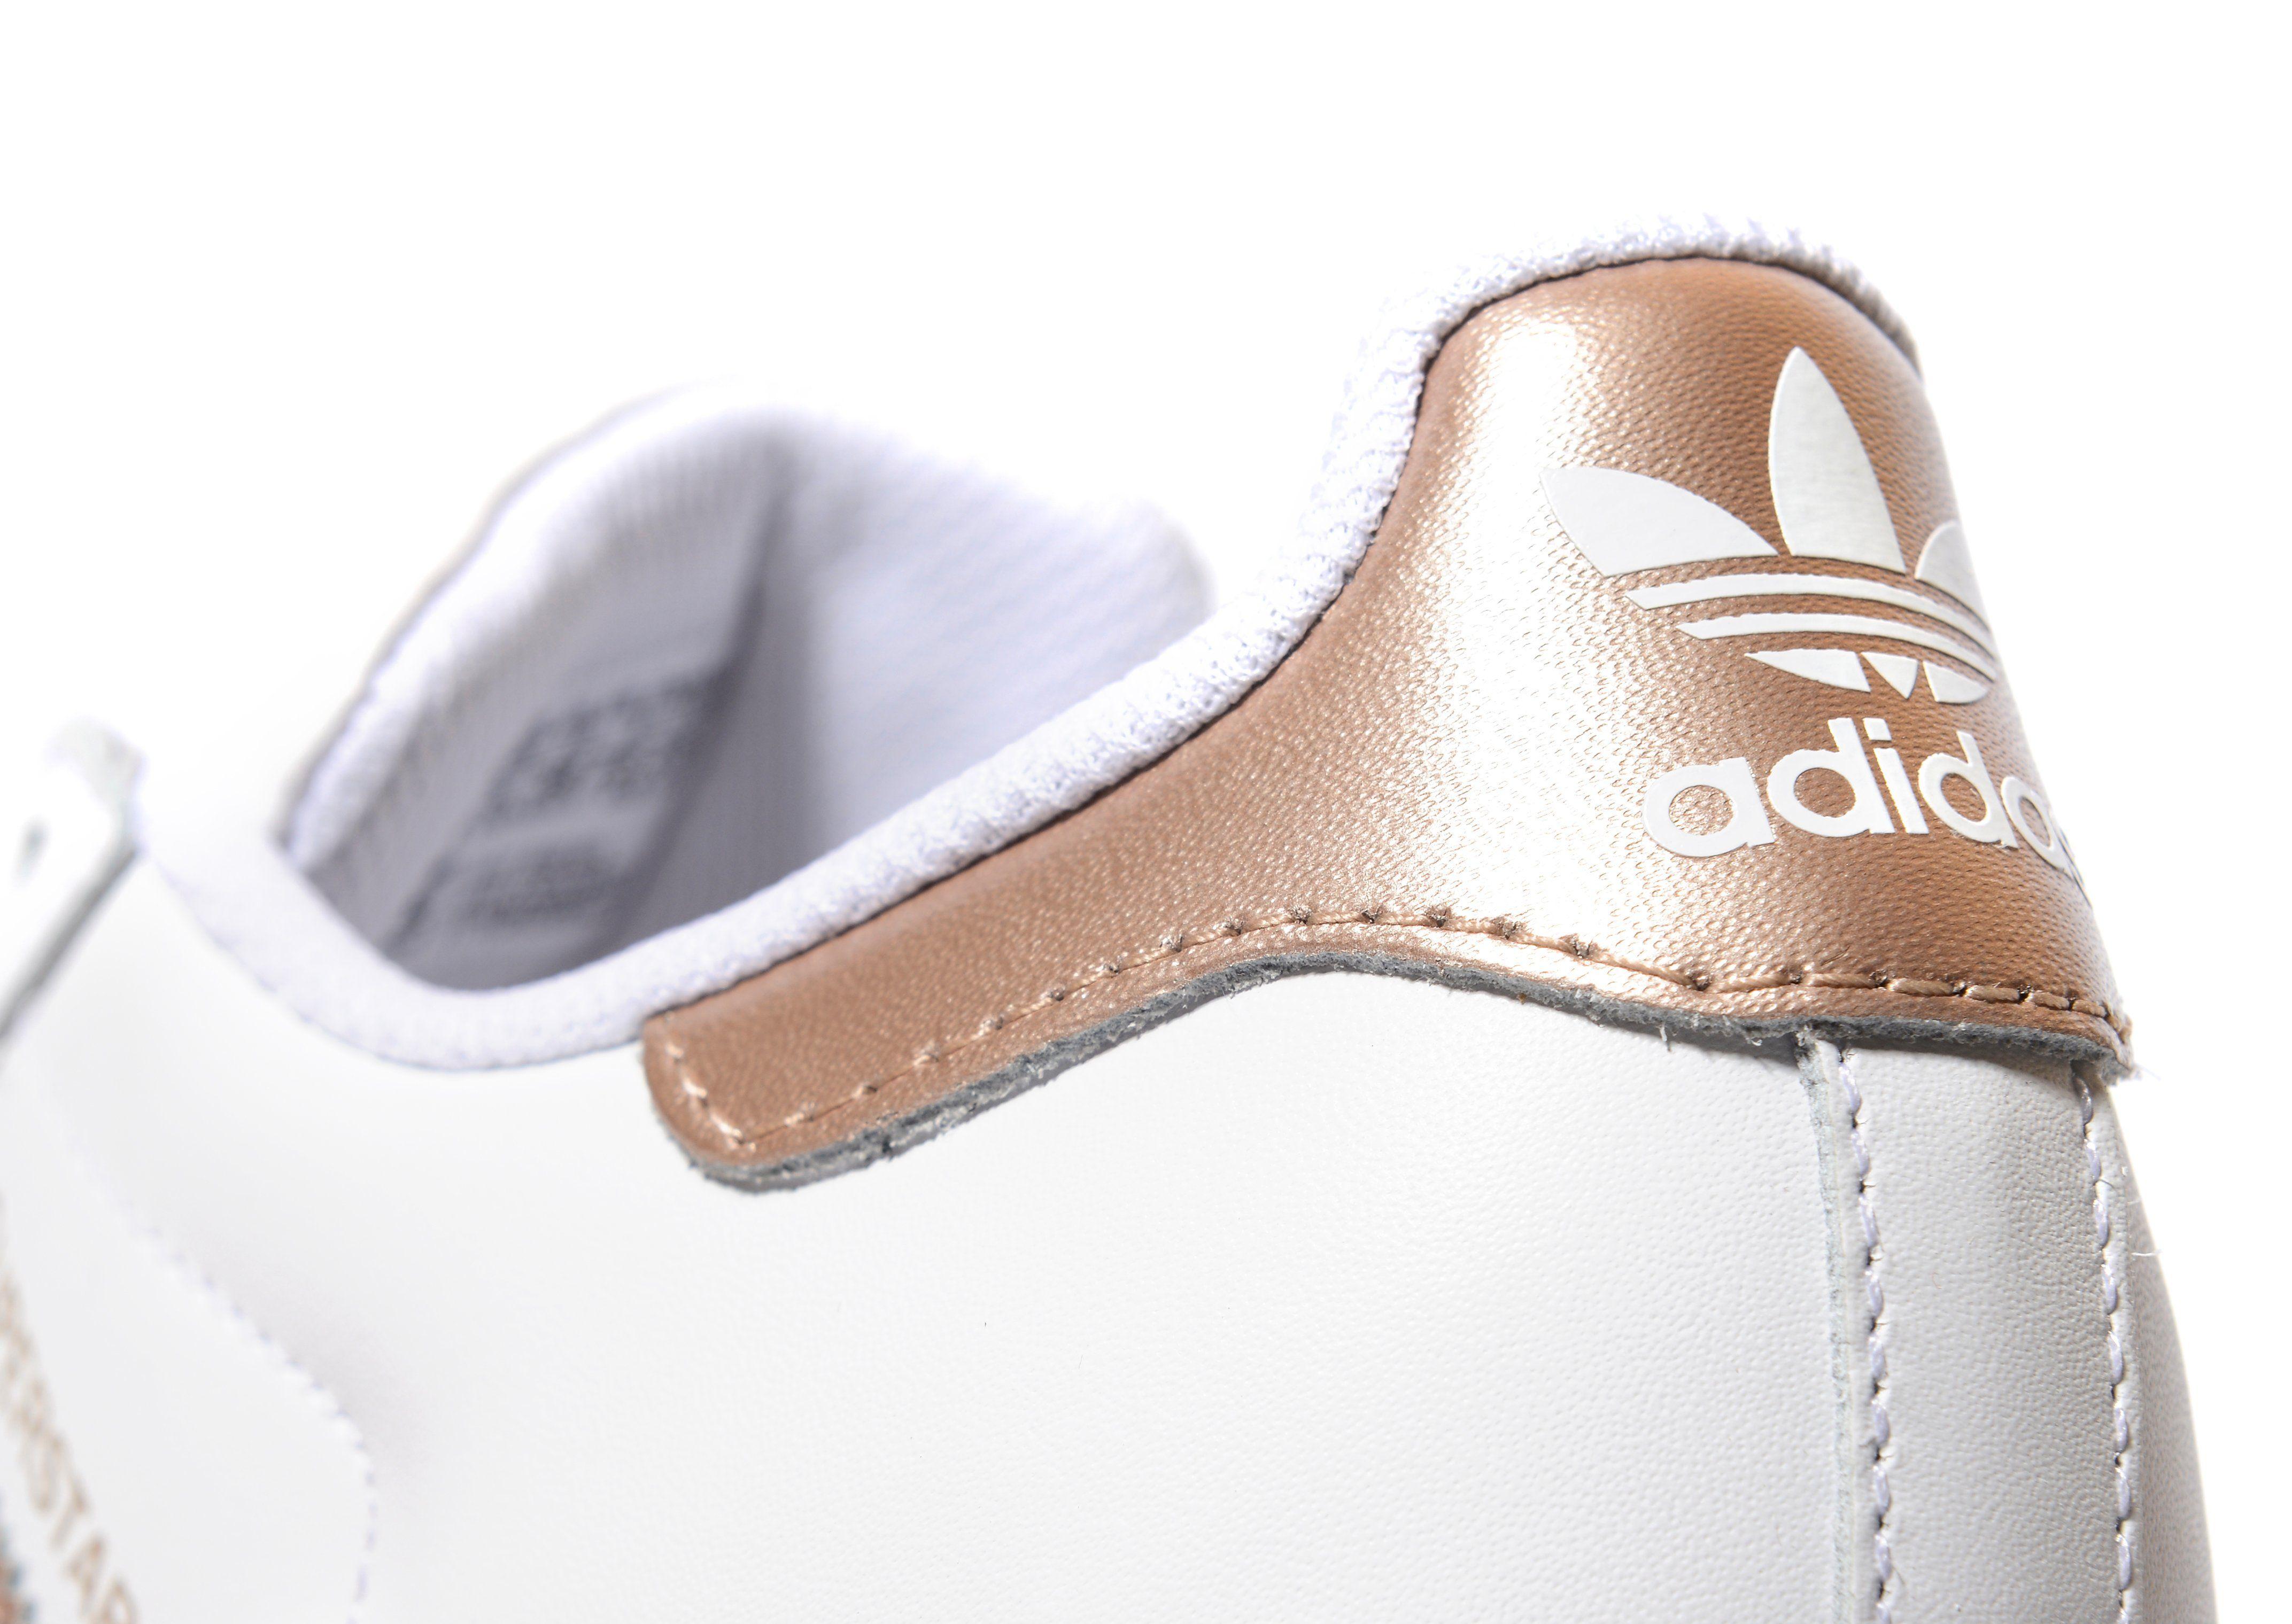 adidas Originals Superstar Women's